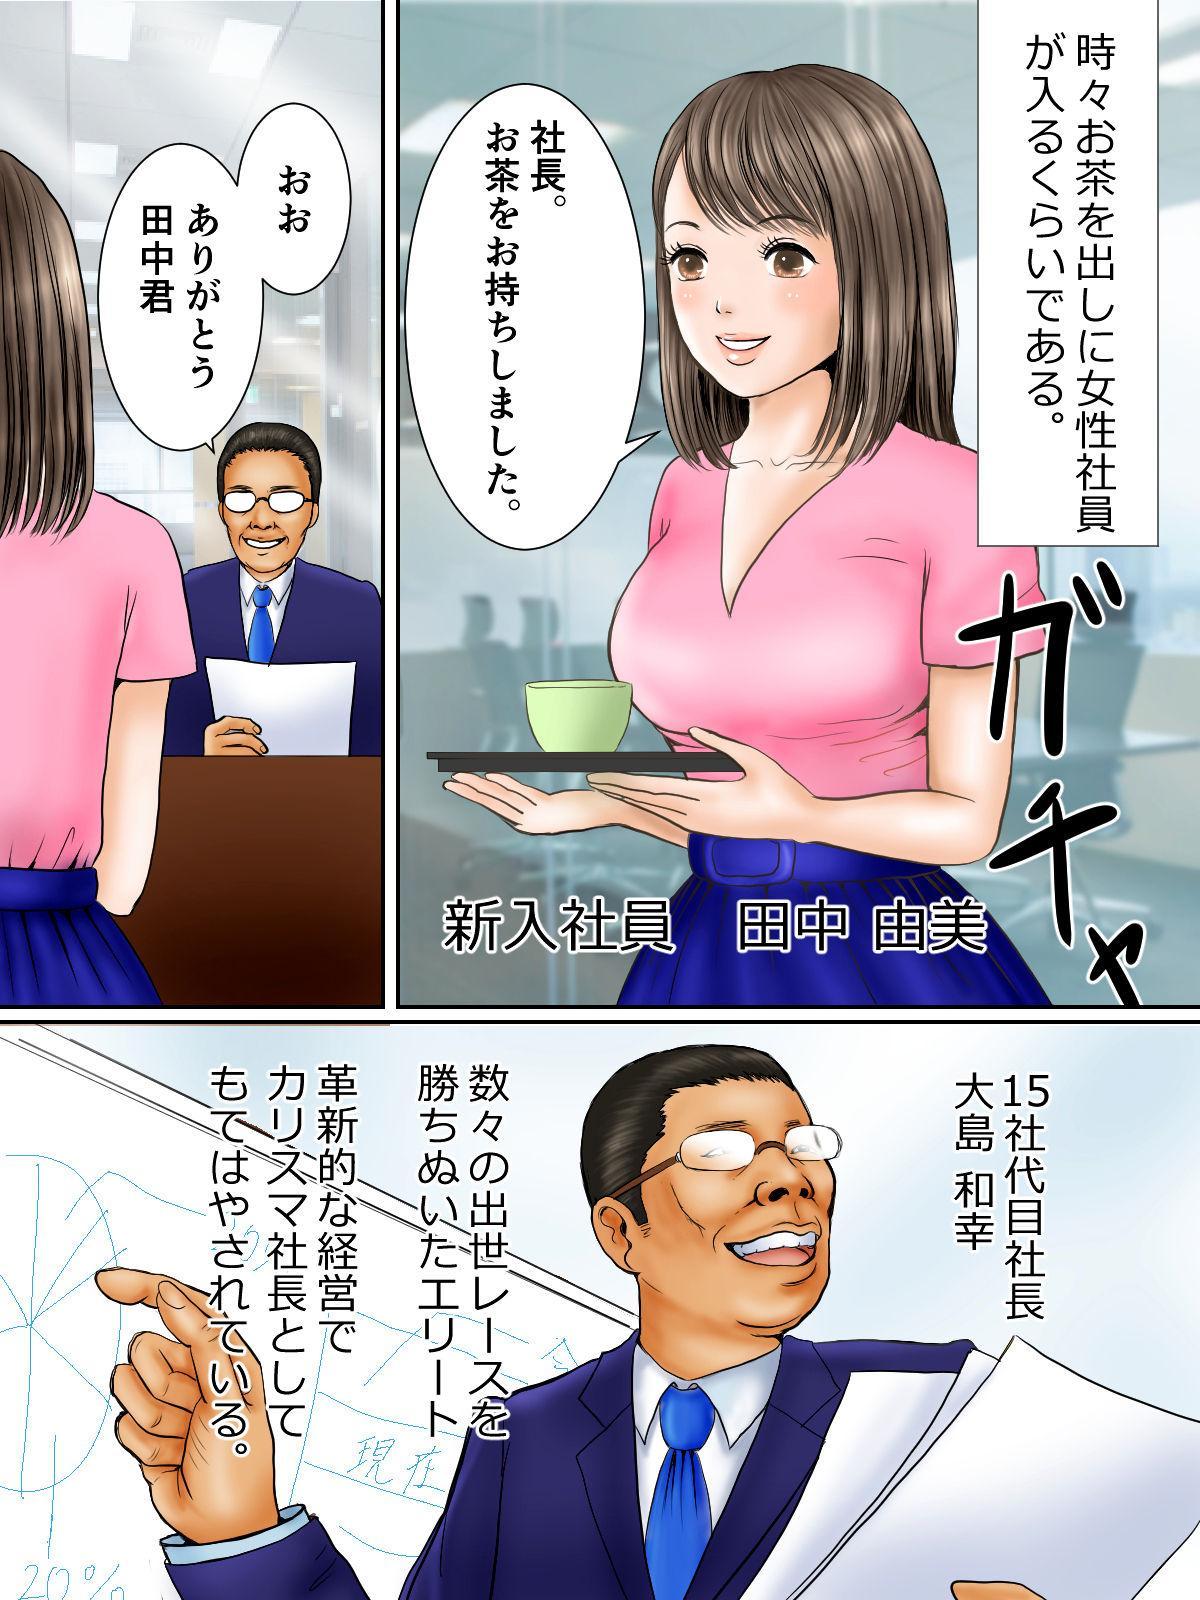 Yuumei Kigyou no Jittai 2